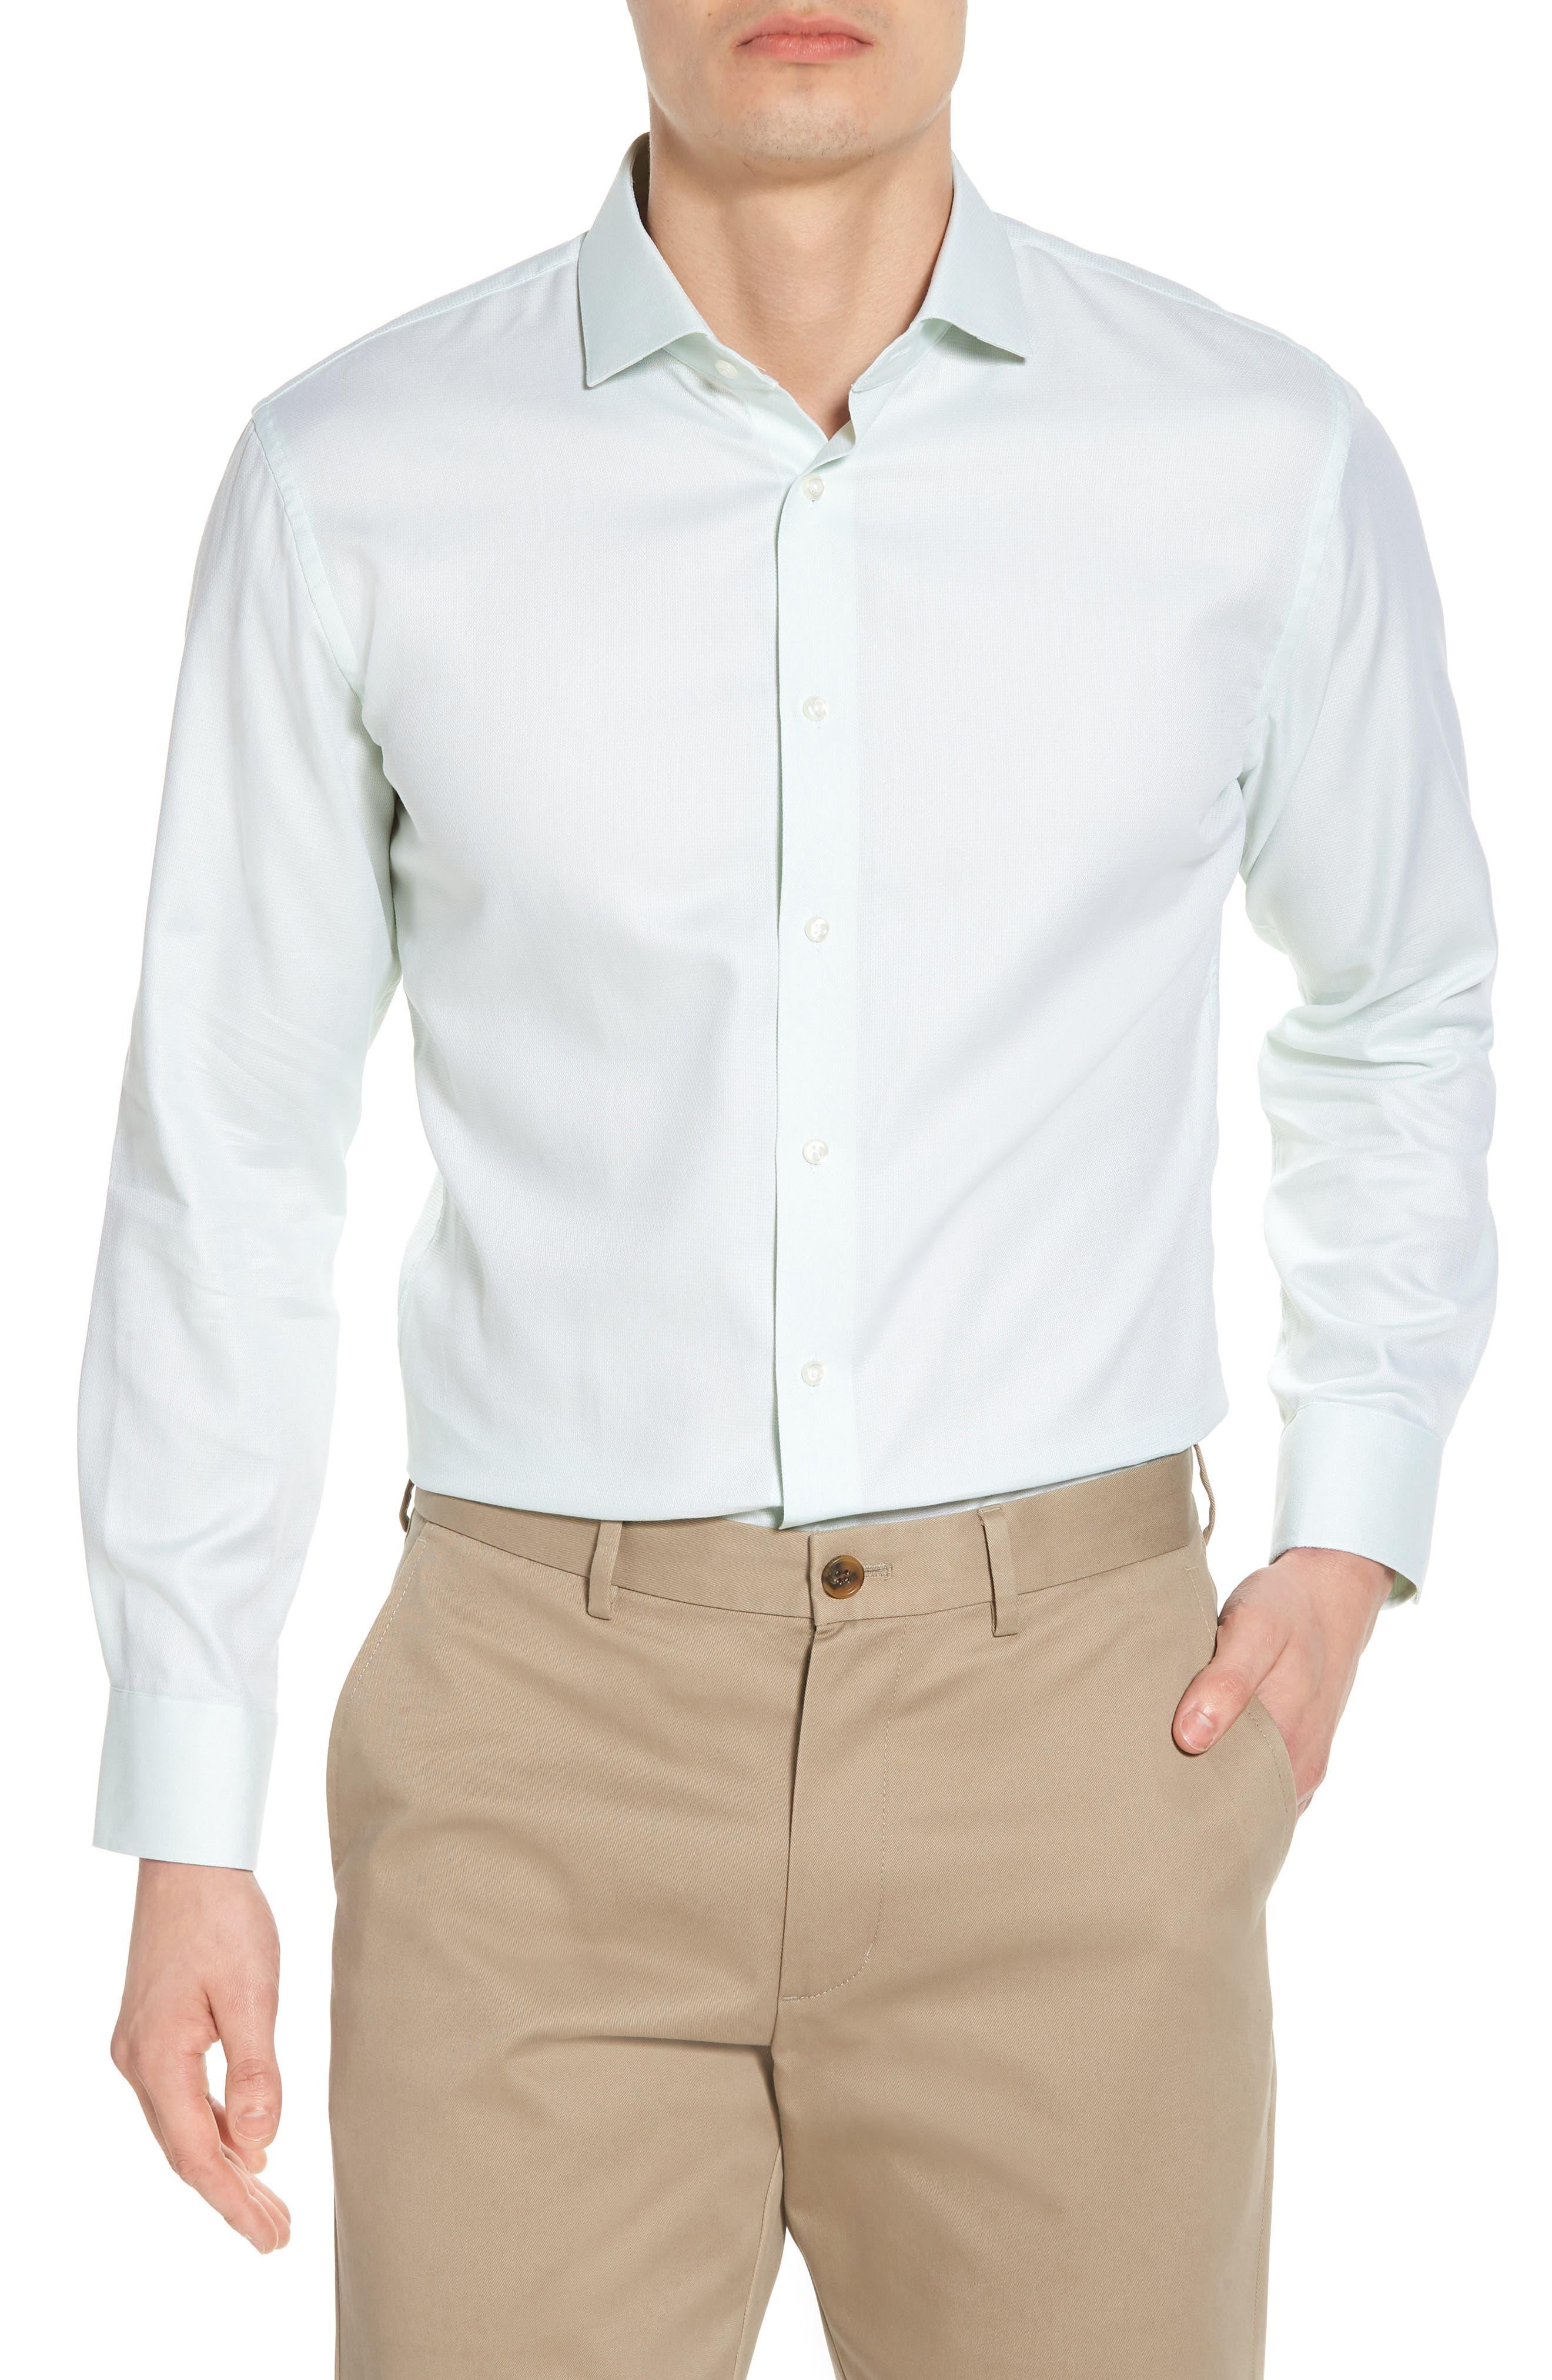 Trim Fit Solid Dress Shirt,                             Main thumbnail 1, color,                             Green Screen